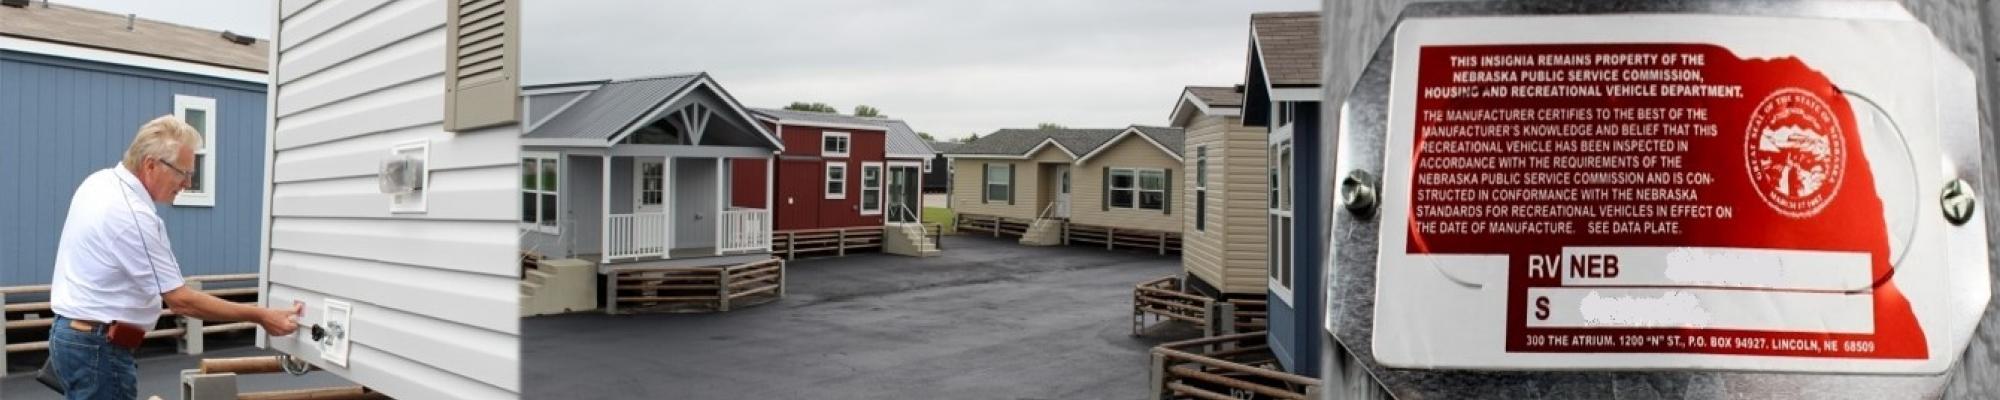 HousingCollage-5